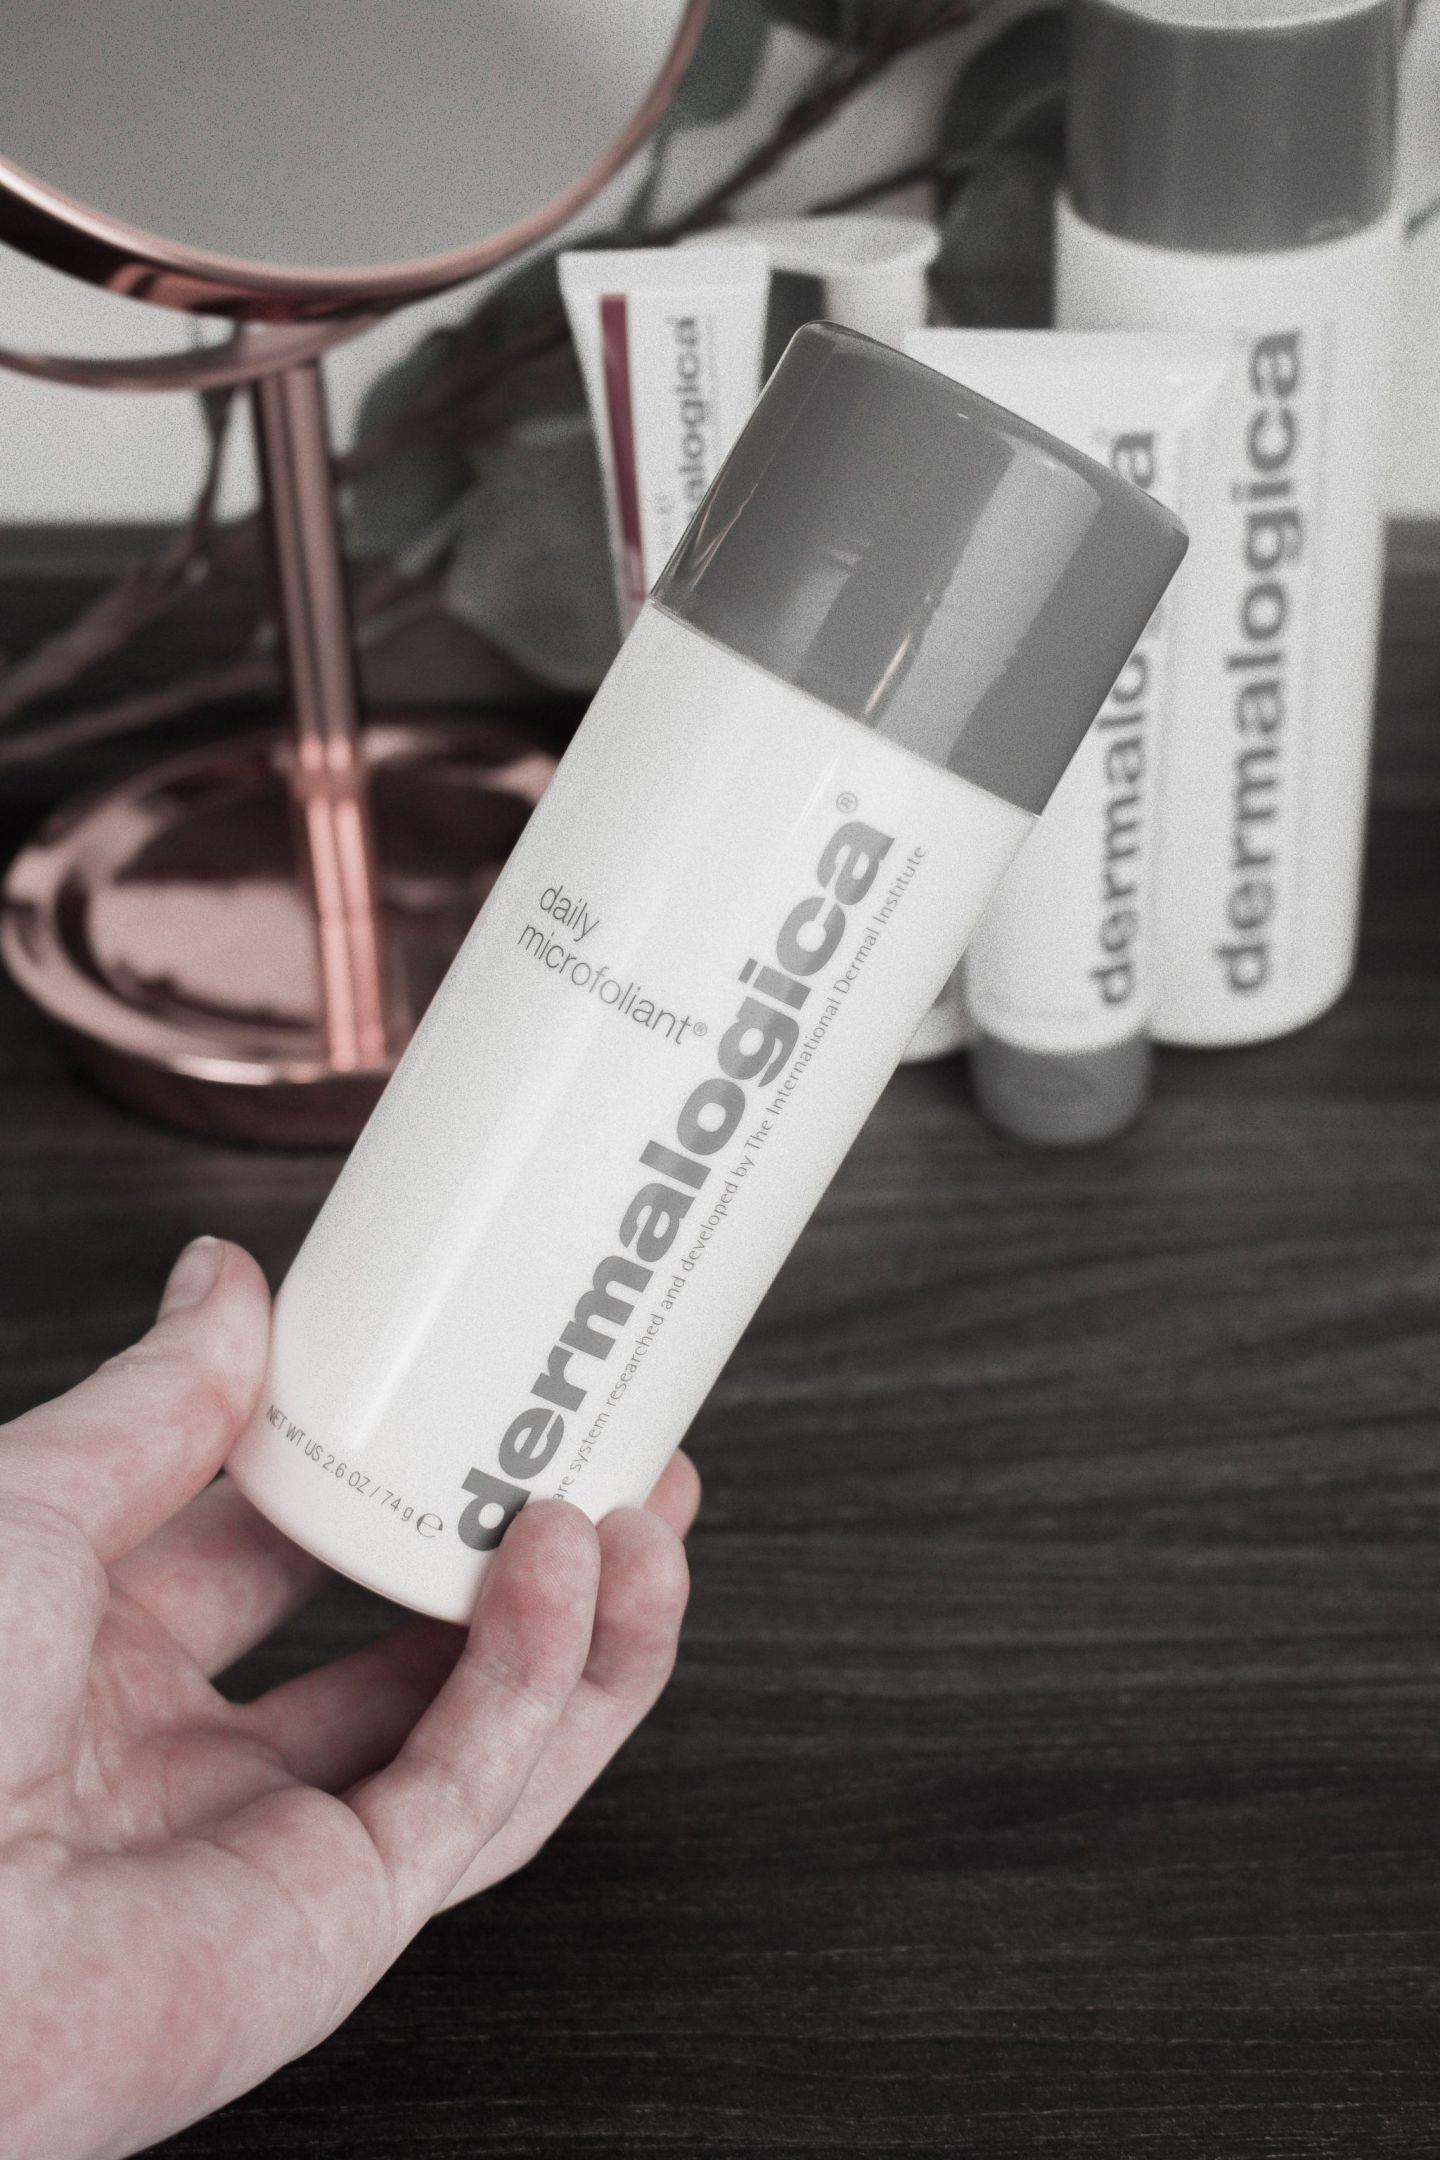 Dermalogica Skincare Routine Daily Microfoliant